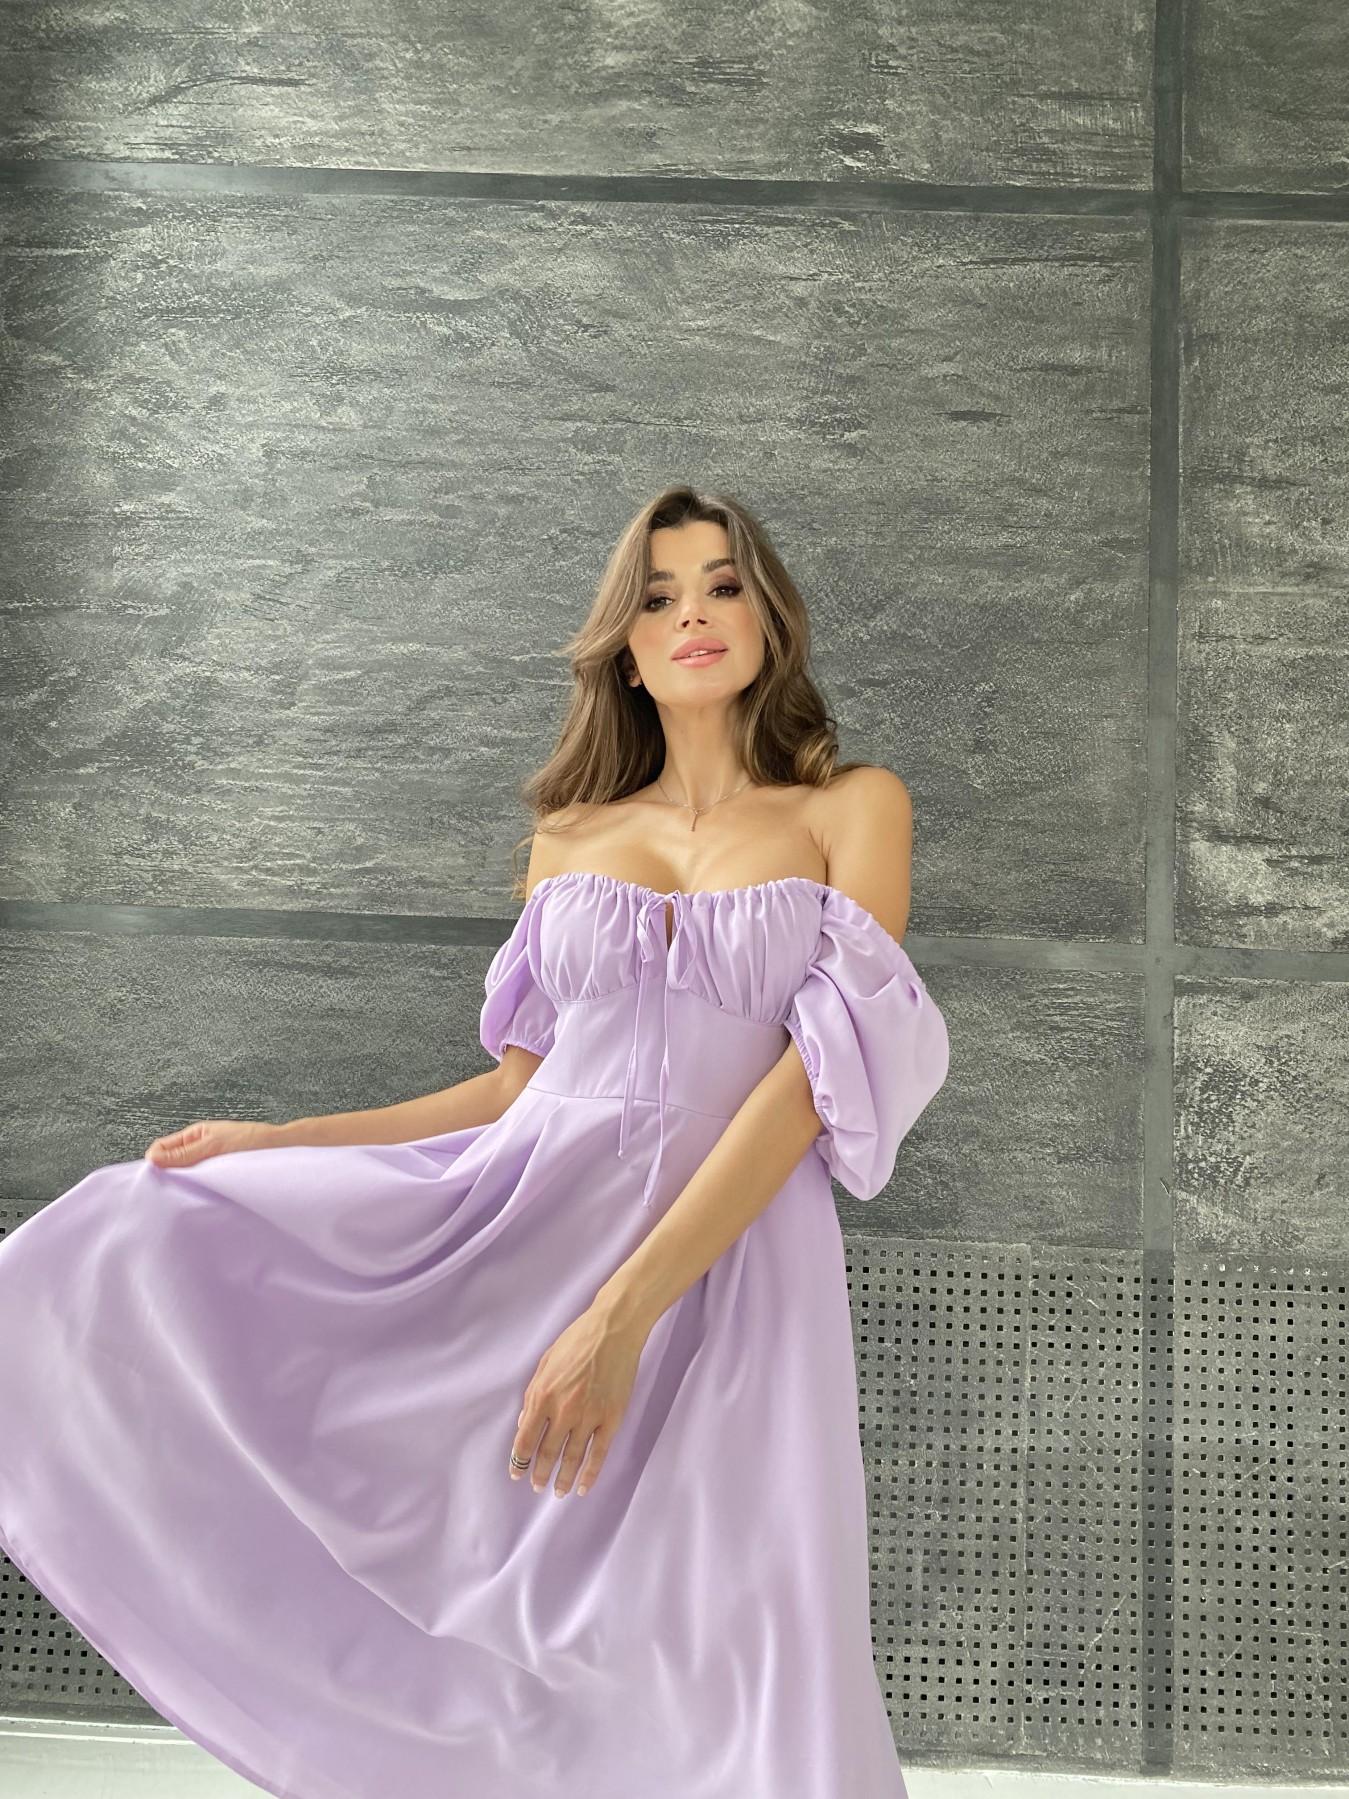 Кисес Миди платье из шифона креп 11443 АРТ. 48311 Цвет: Лаванда - фото 9, интернет магазин tm-modus.ru